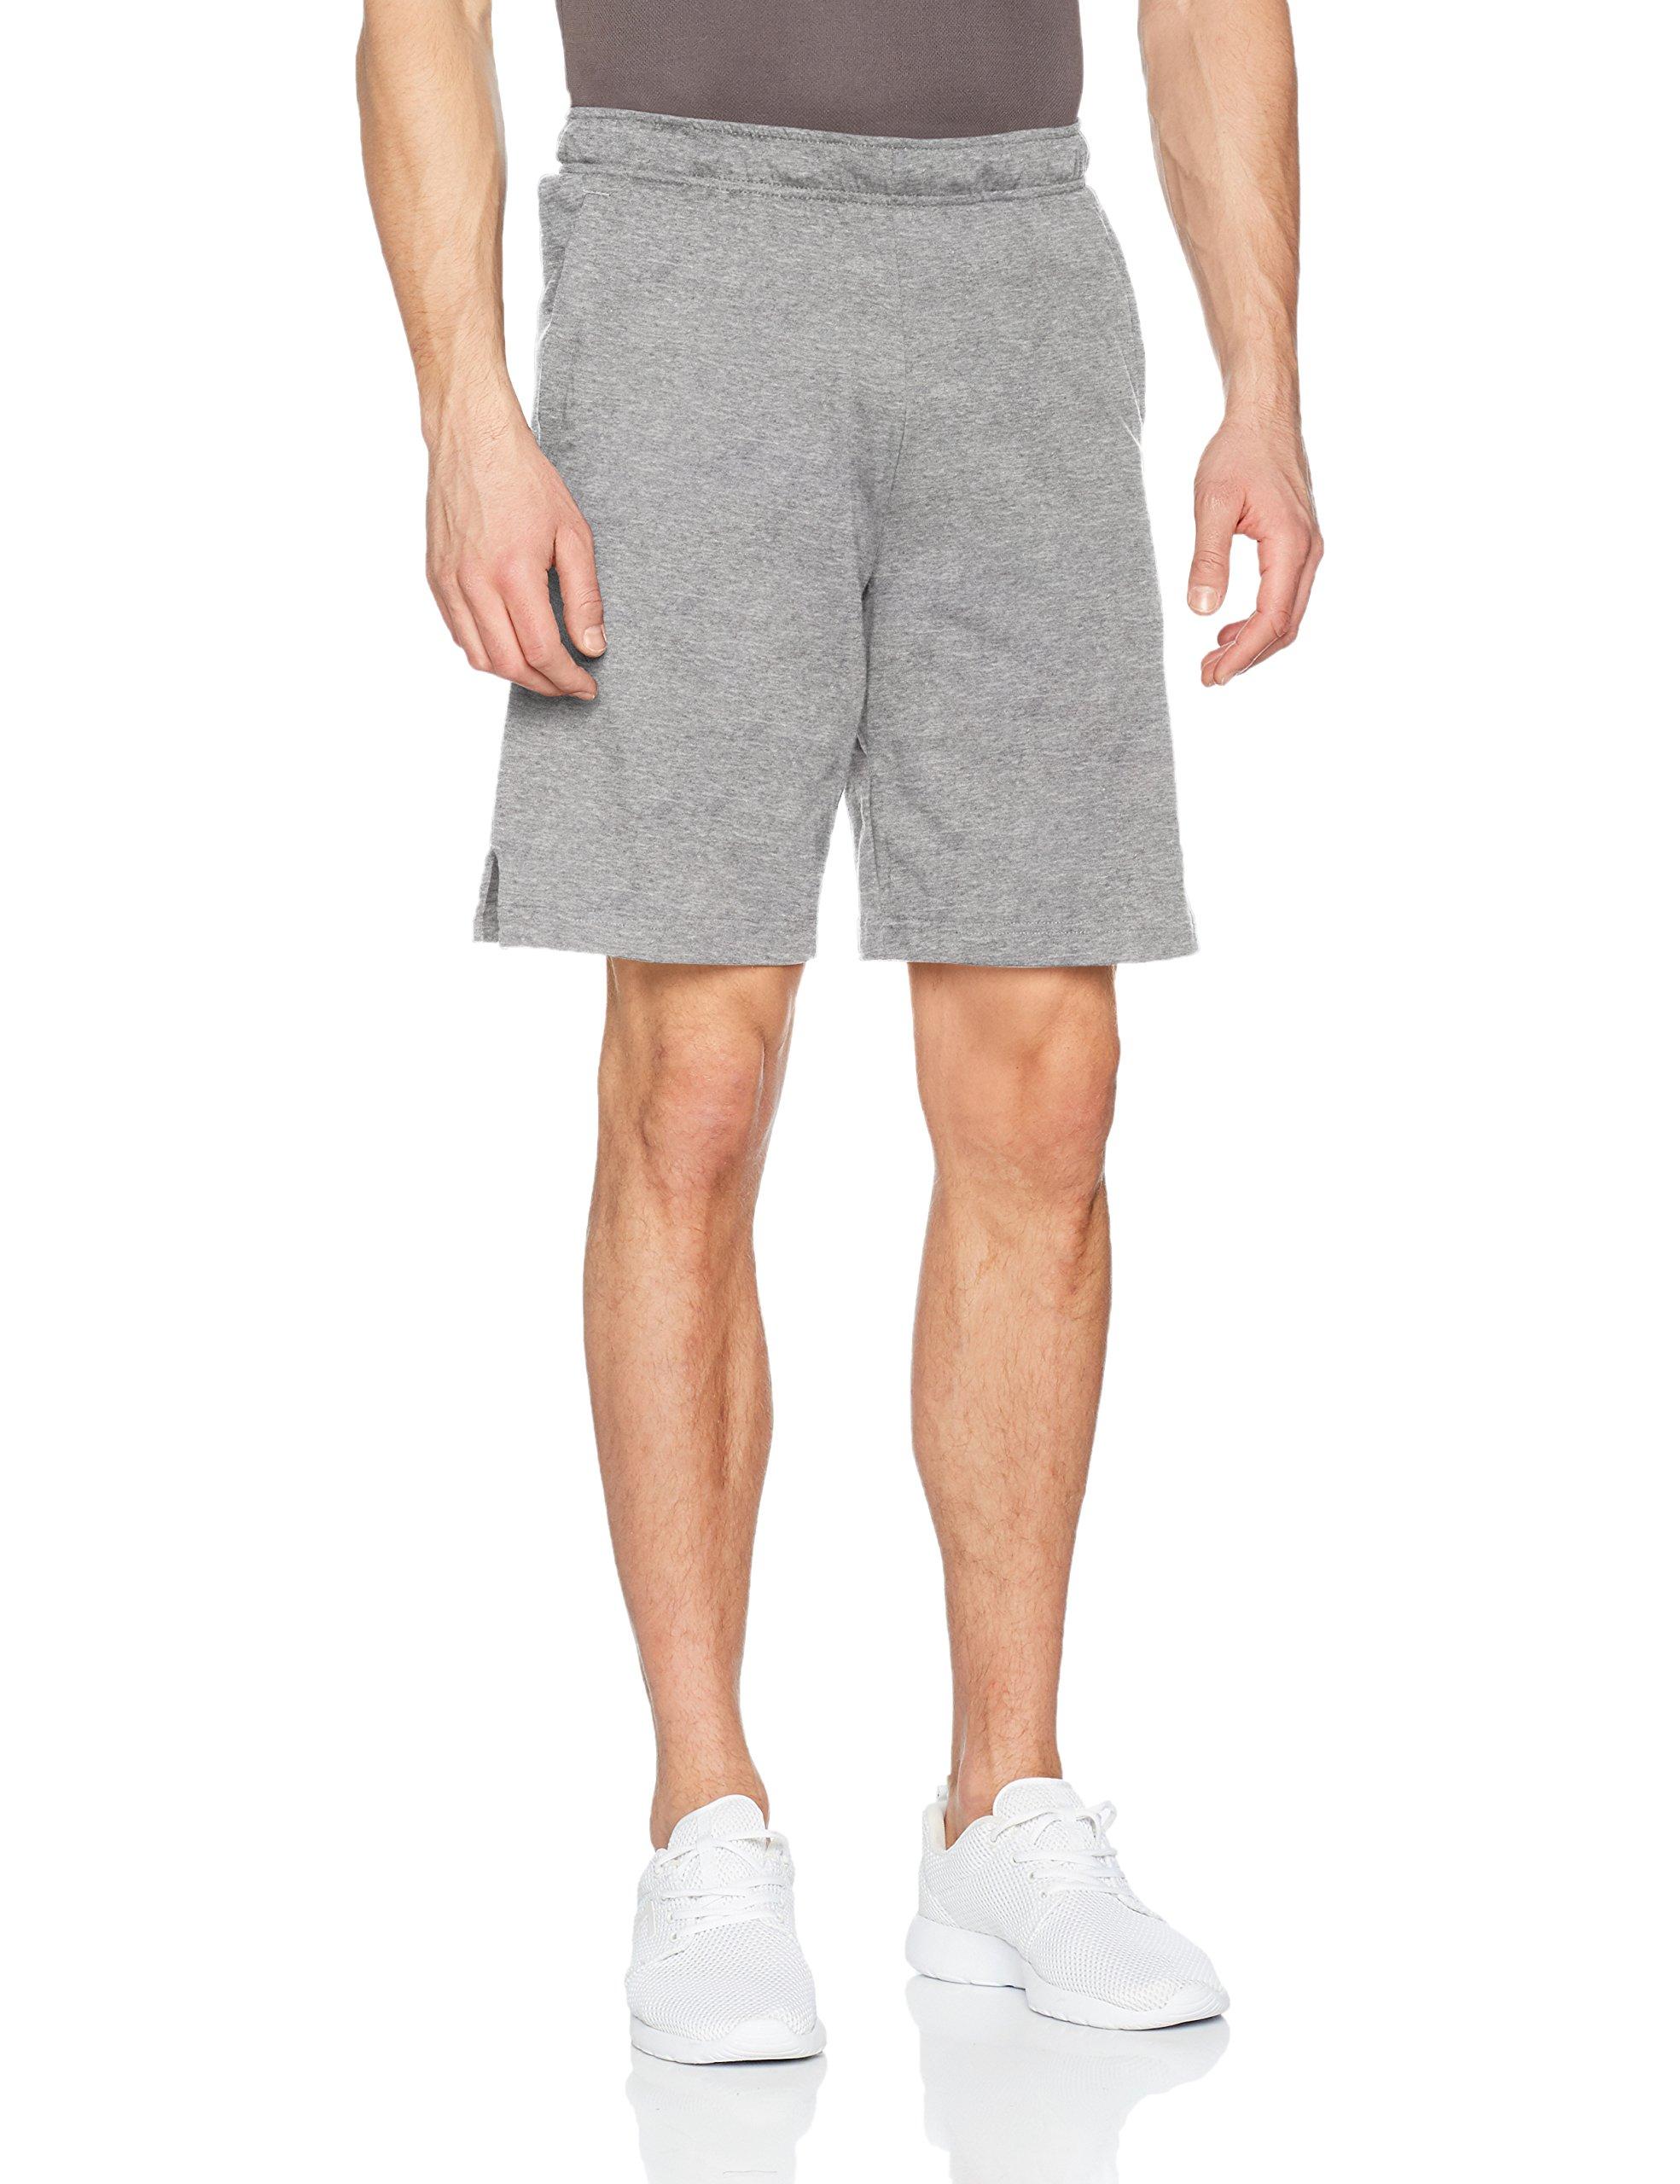 Nike Mens Dri-Fit Cotton Training Shorts Carbon Heather/Black Size Large by Nike